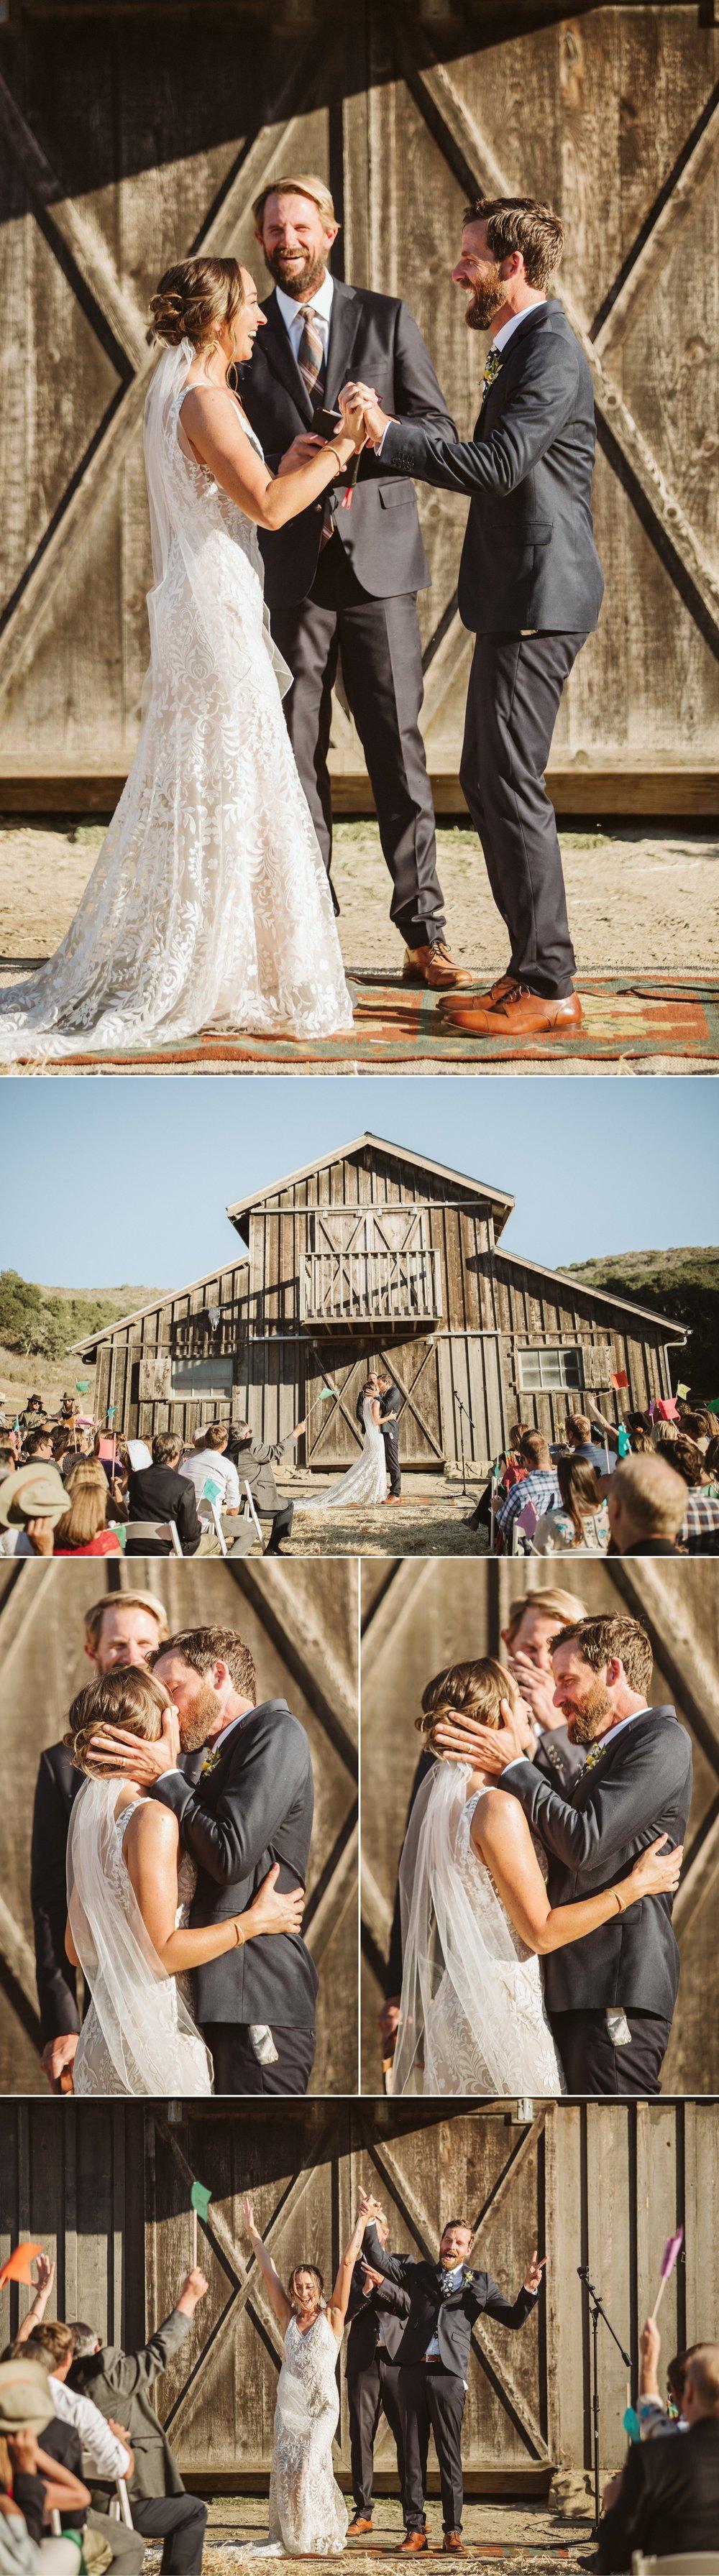 Colorful Barn Wedding at Jalama Canon Ranch- Lompoc- Santa Barbara- Geoff & Lauren 20.jpg